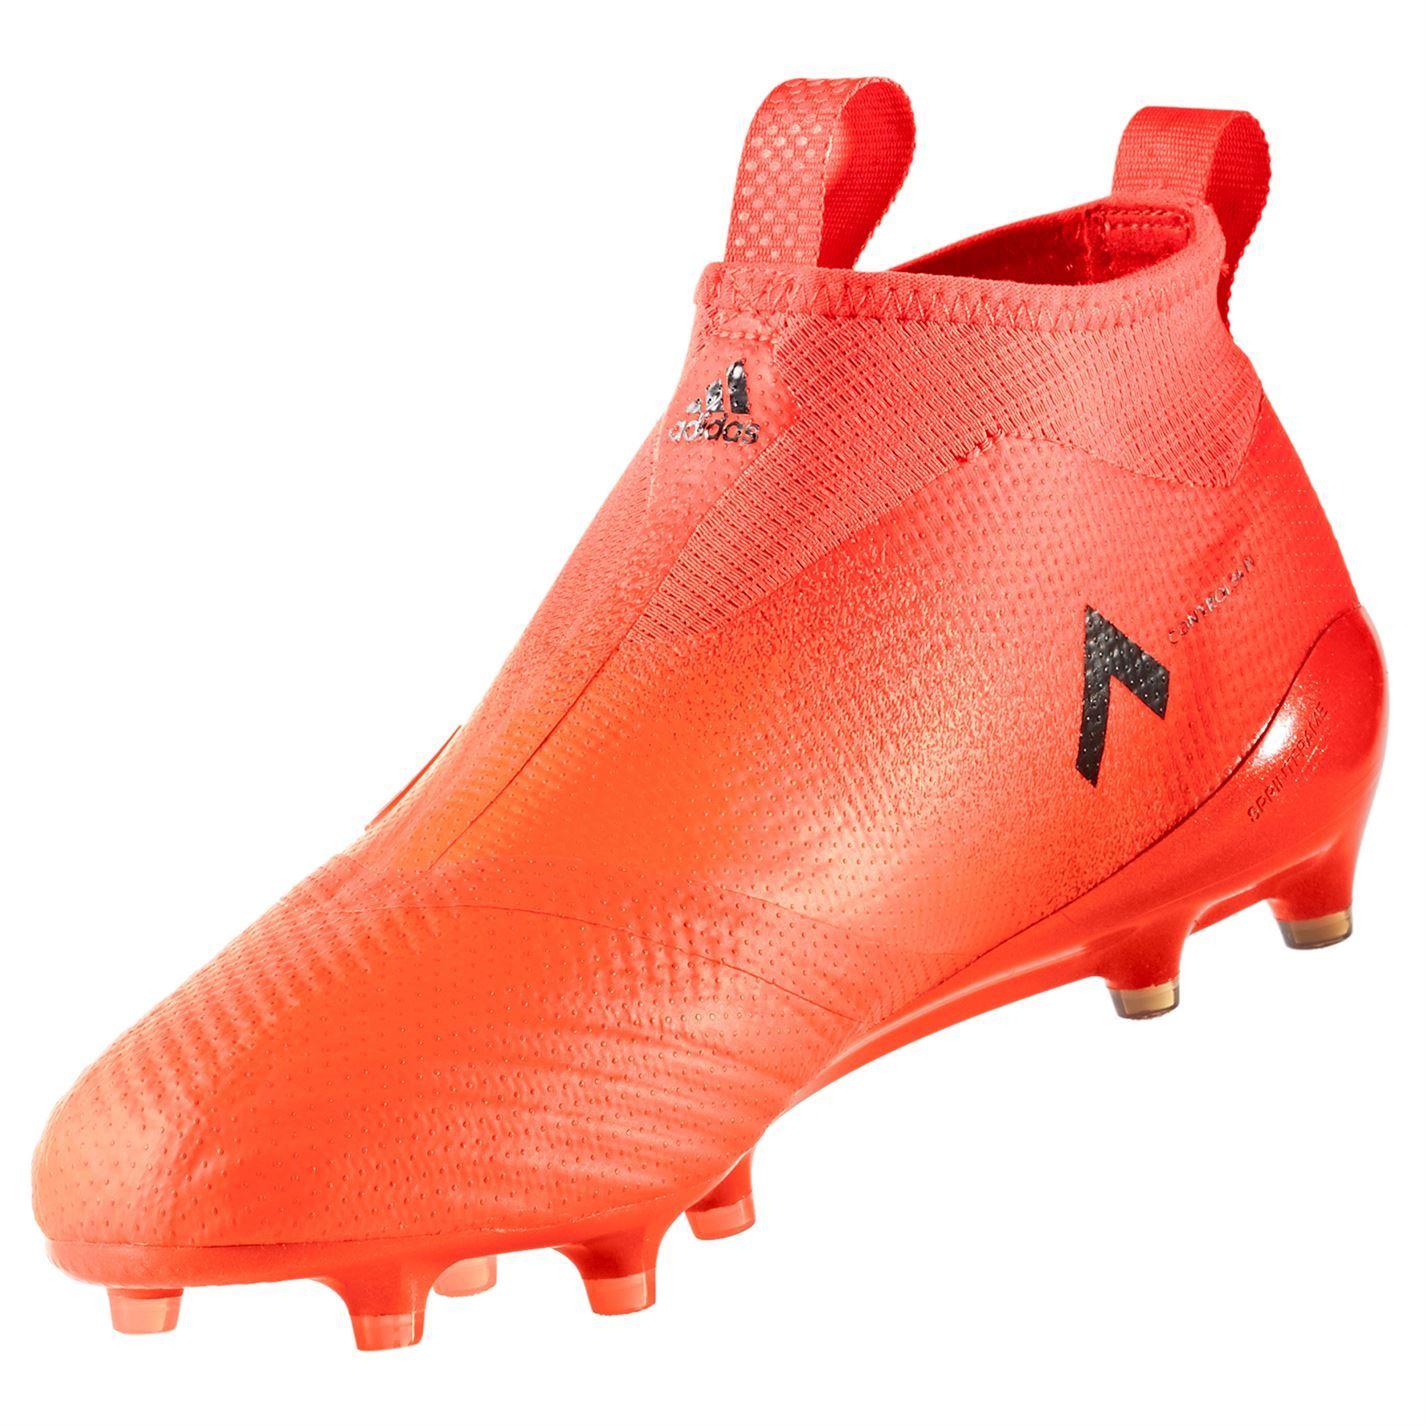 d1da83c78 ... adidas Ace 17 Purecontrol FG Laceless Football Boots Mens Orange Soccer  Cleats ...